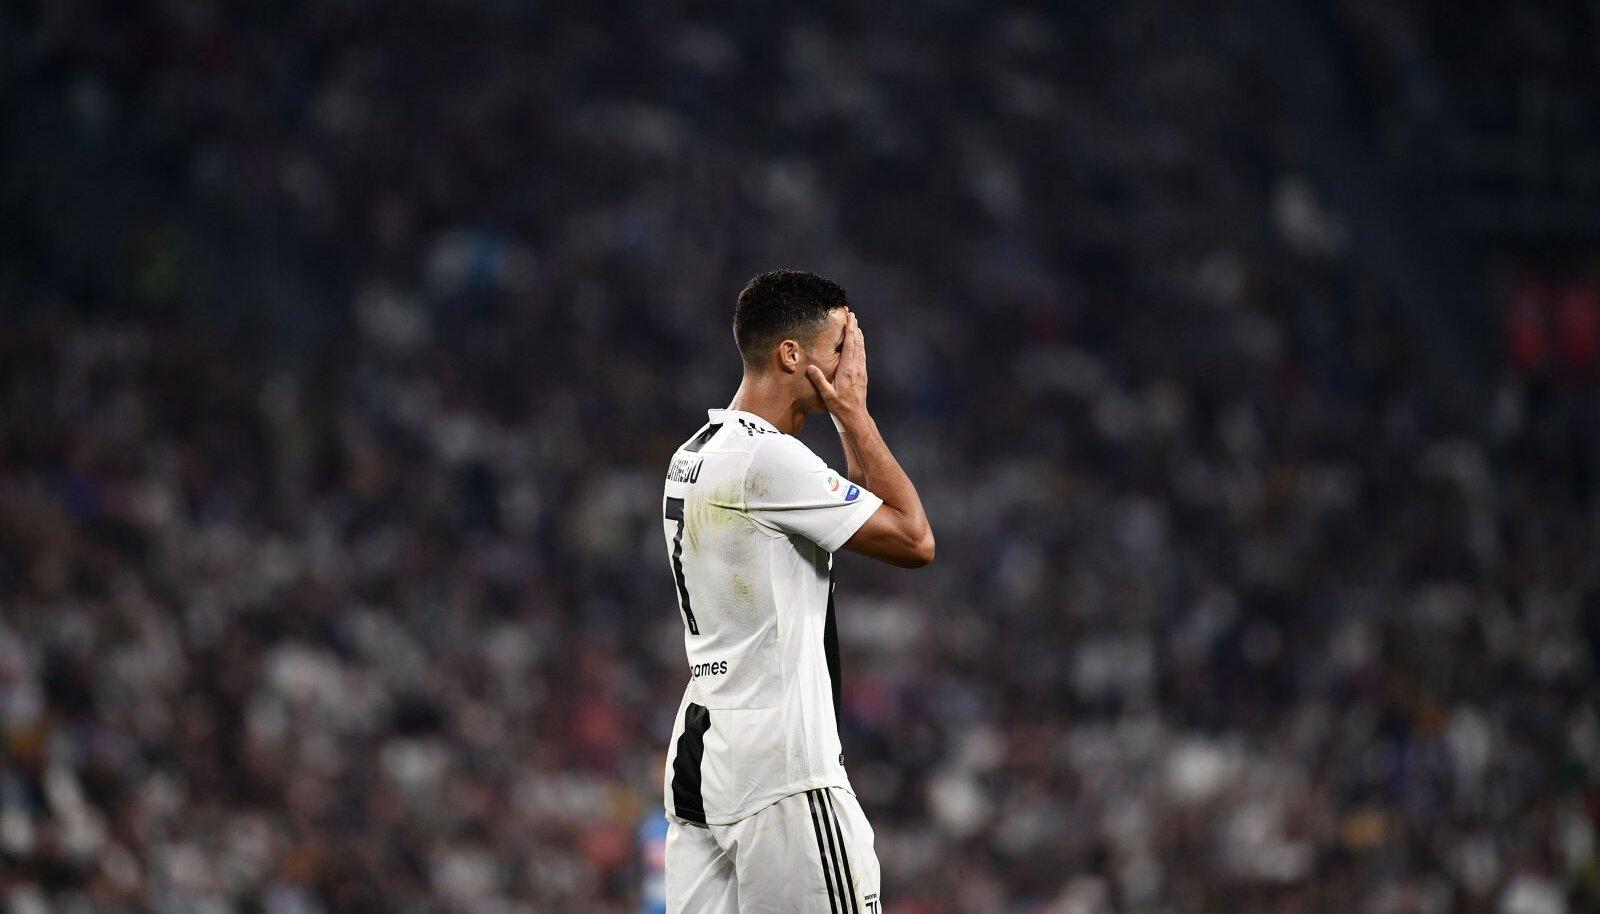 Mis saab Cristiano Ronaldost?